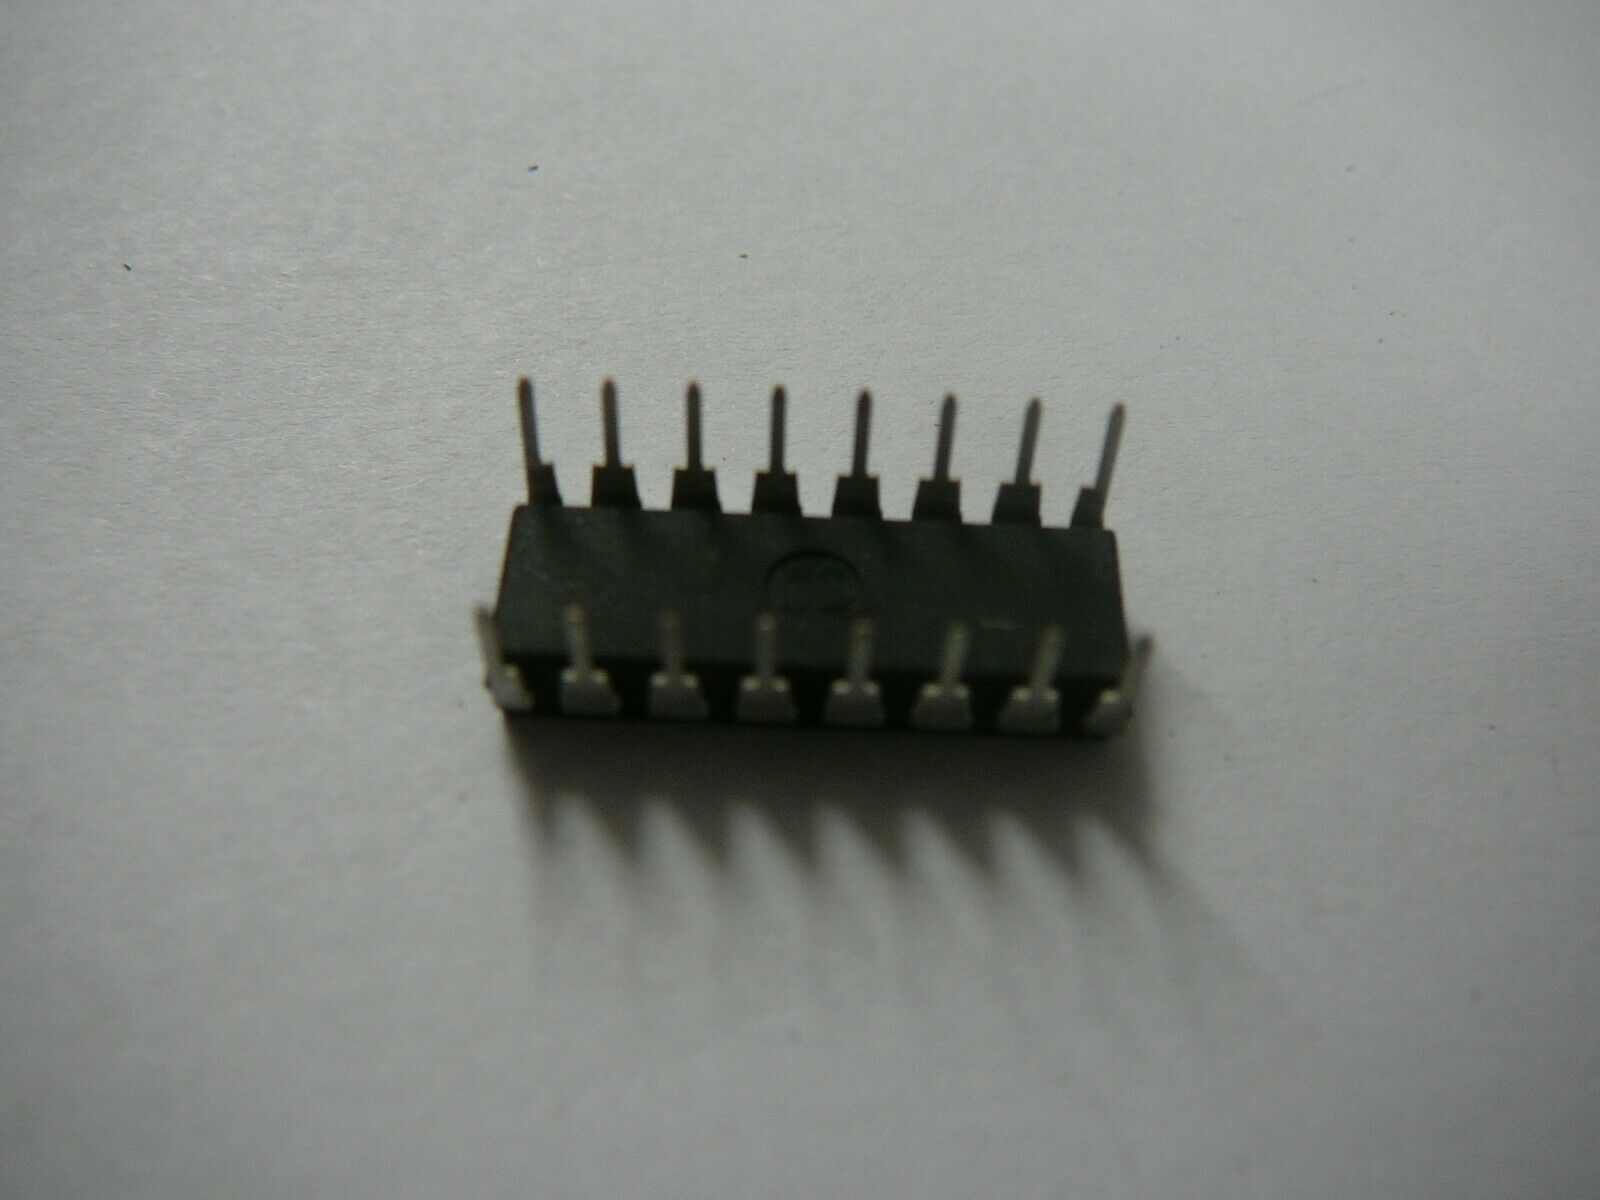 SN 74LS04 Integrierter Schaltkreis Hex Wechselrichter SN74LS04